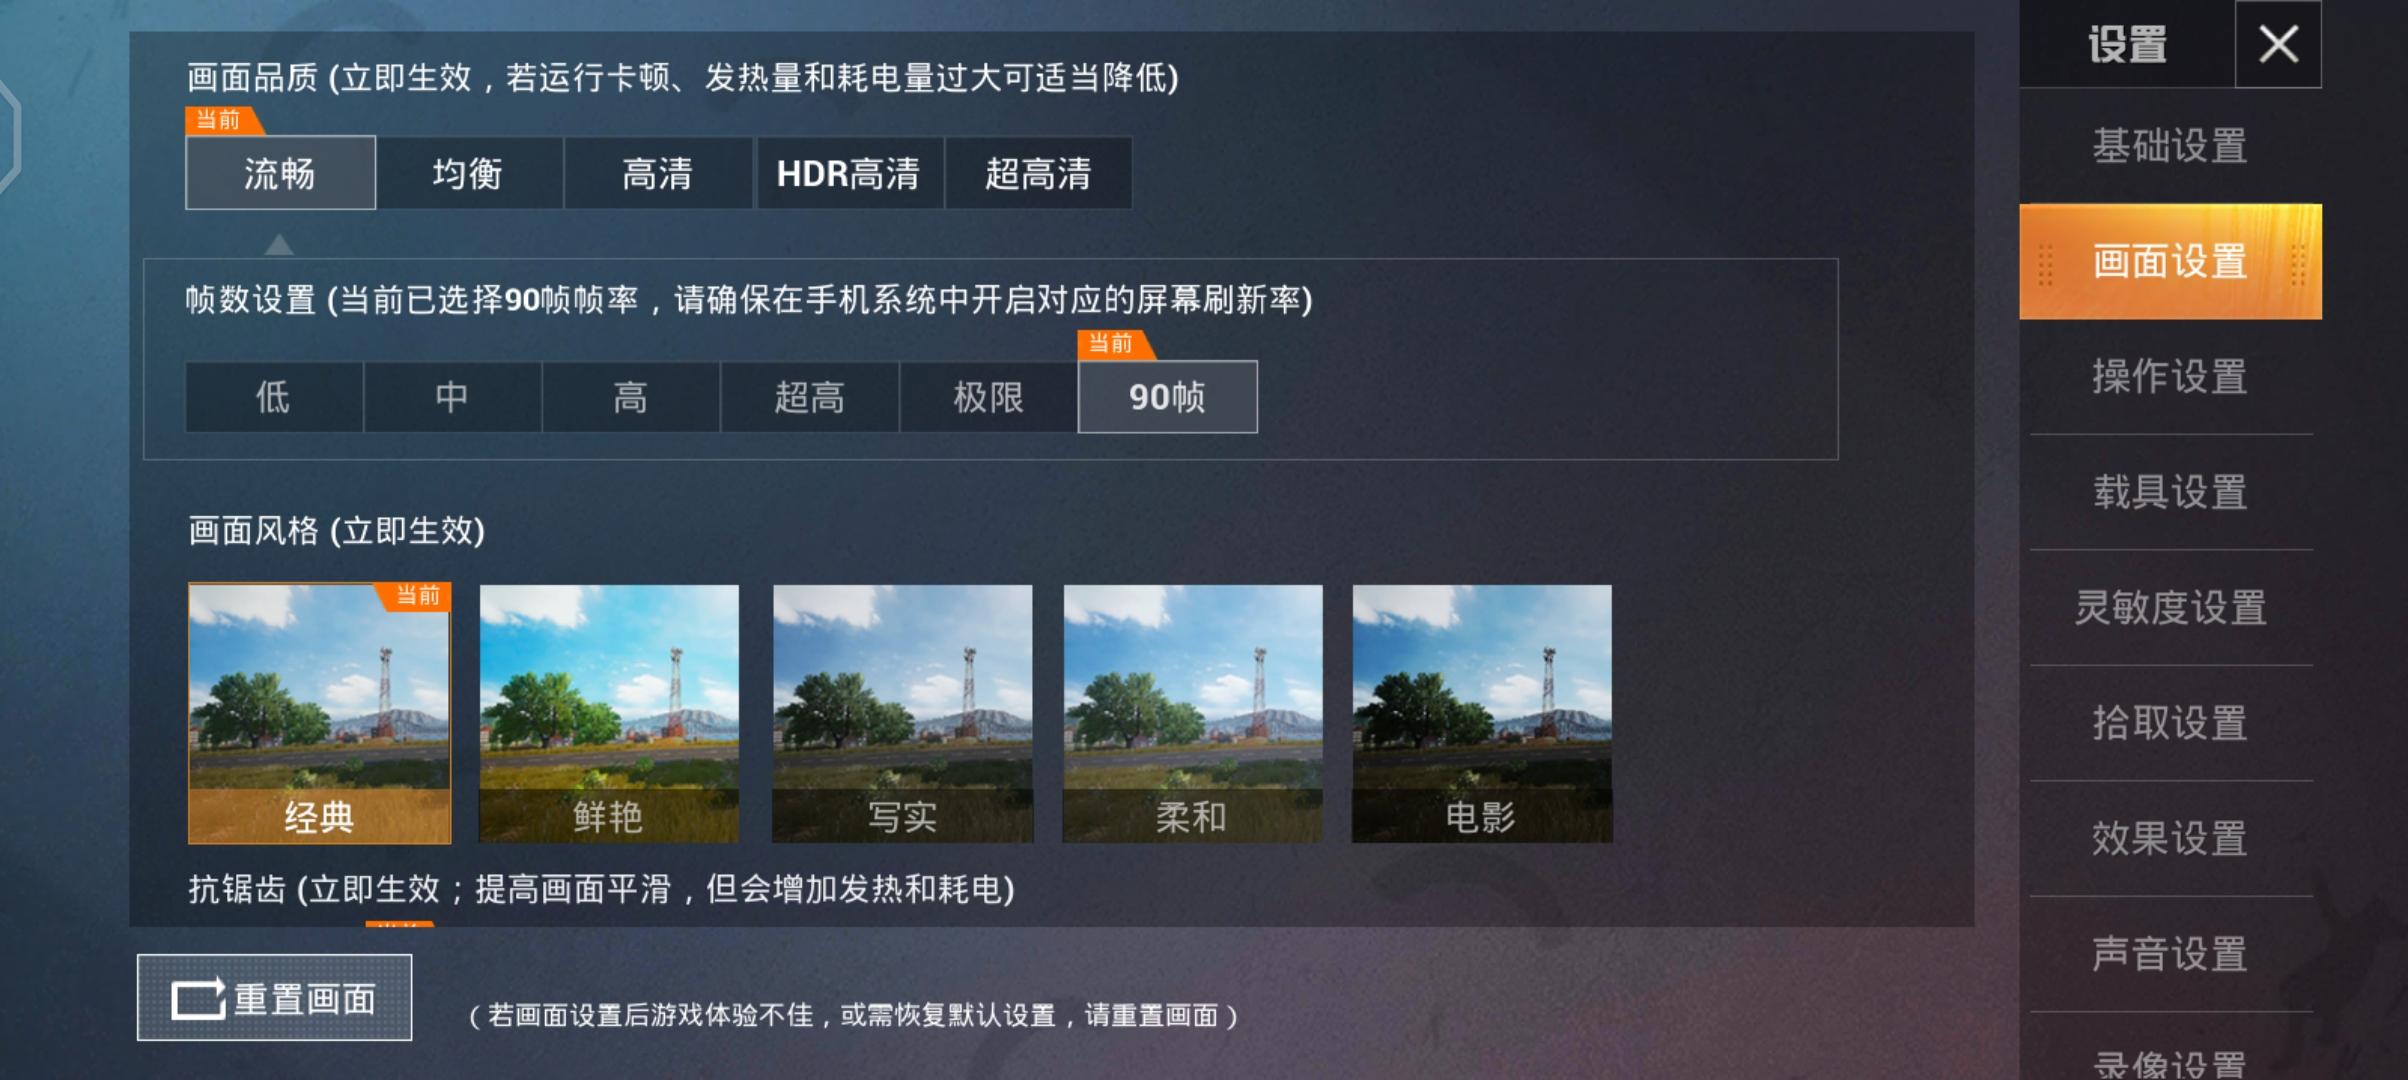 iQOO Neo 3评测:2698元也可以拥有旗舰机的快乐